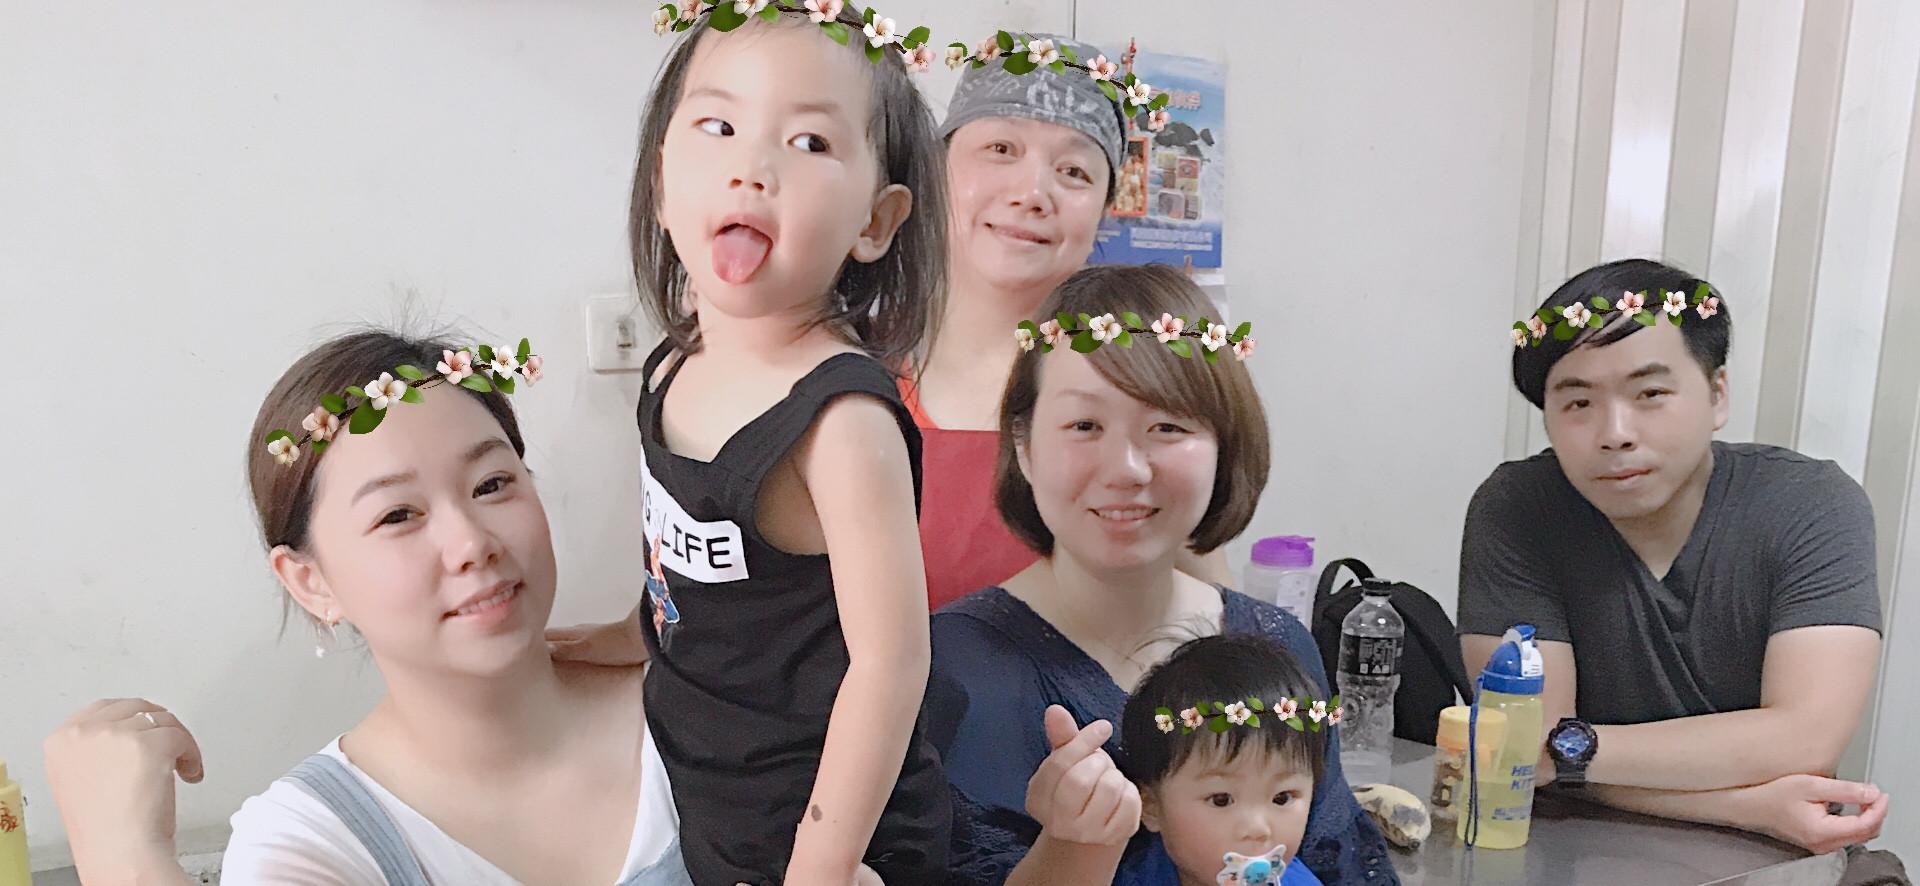 Alice Li 的個人封面